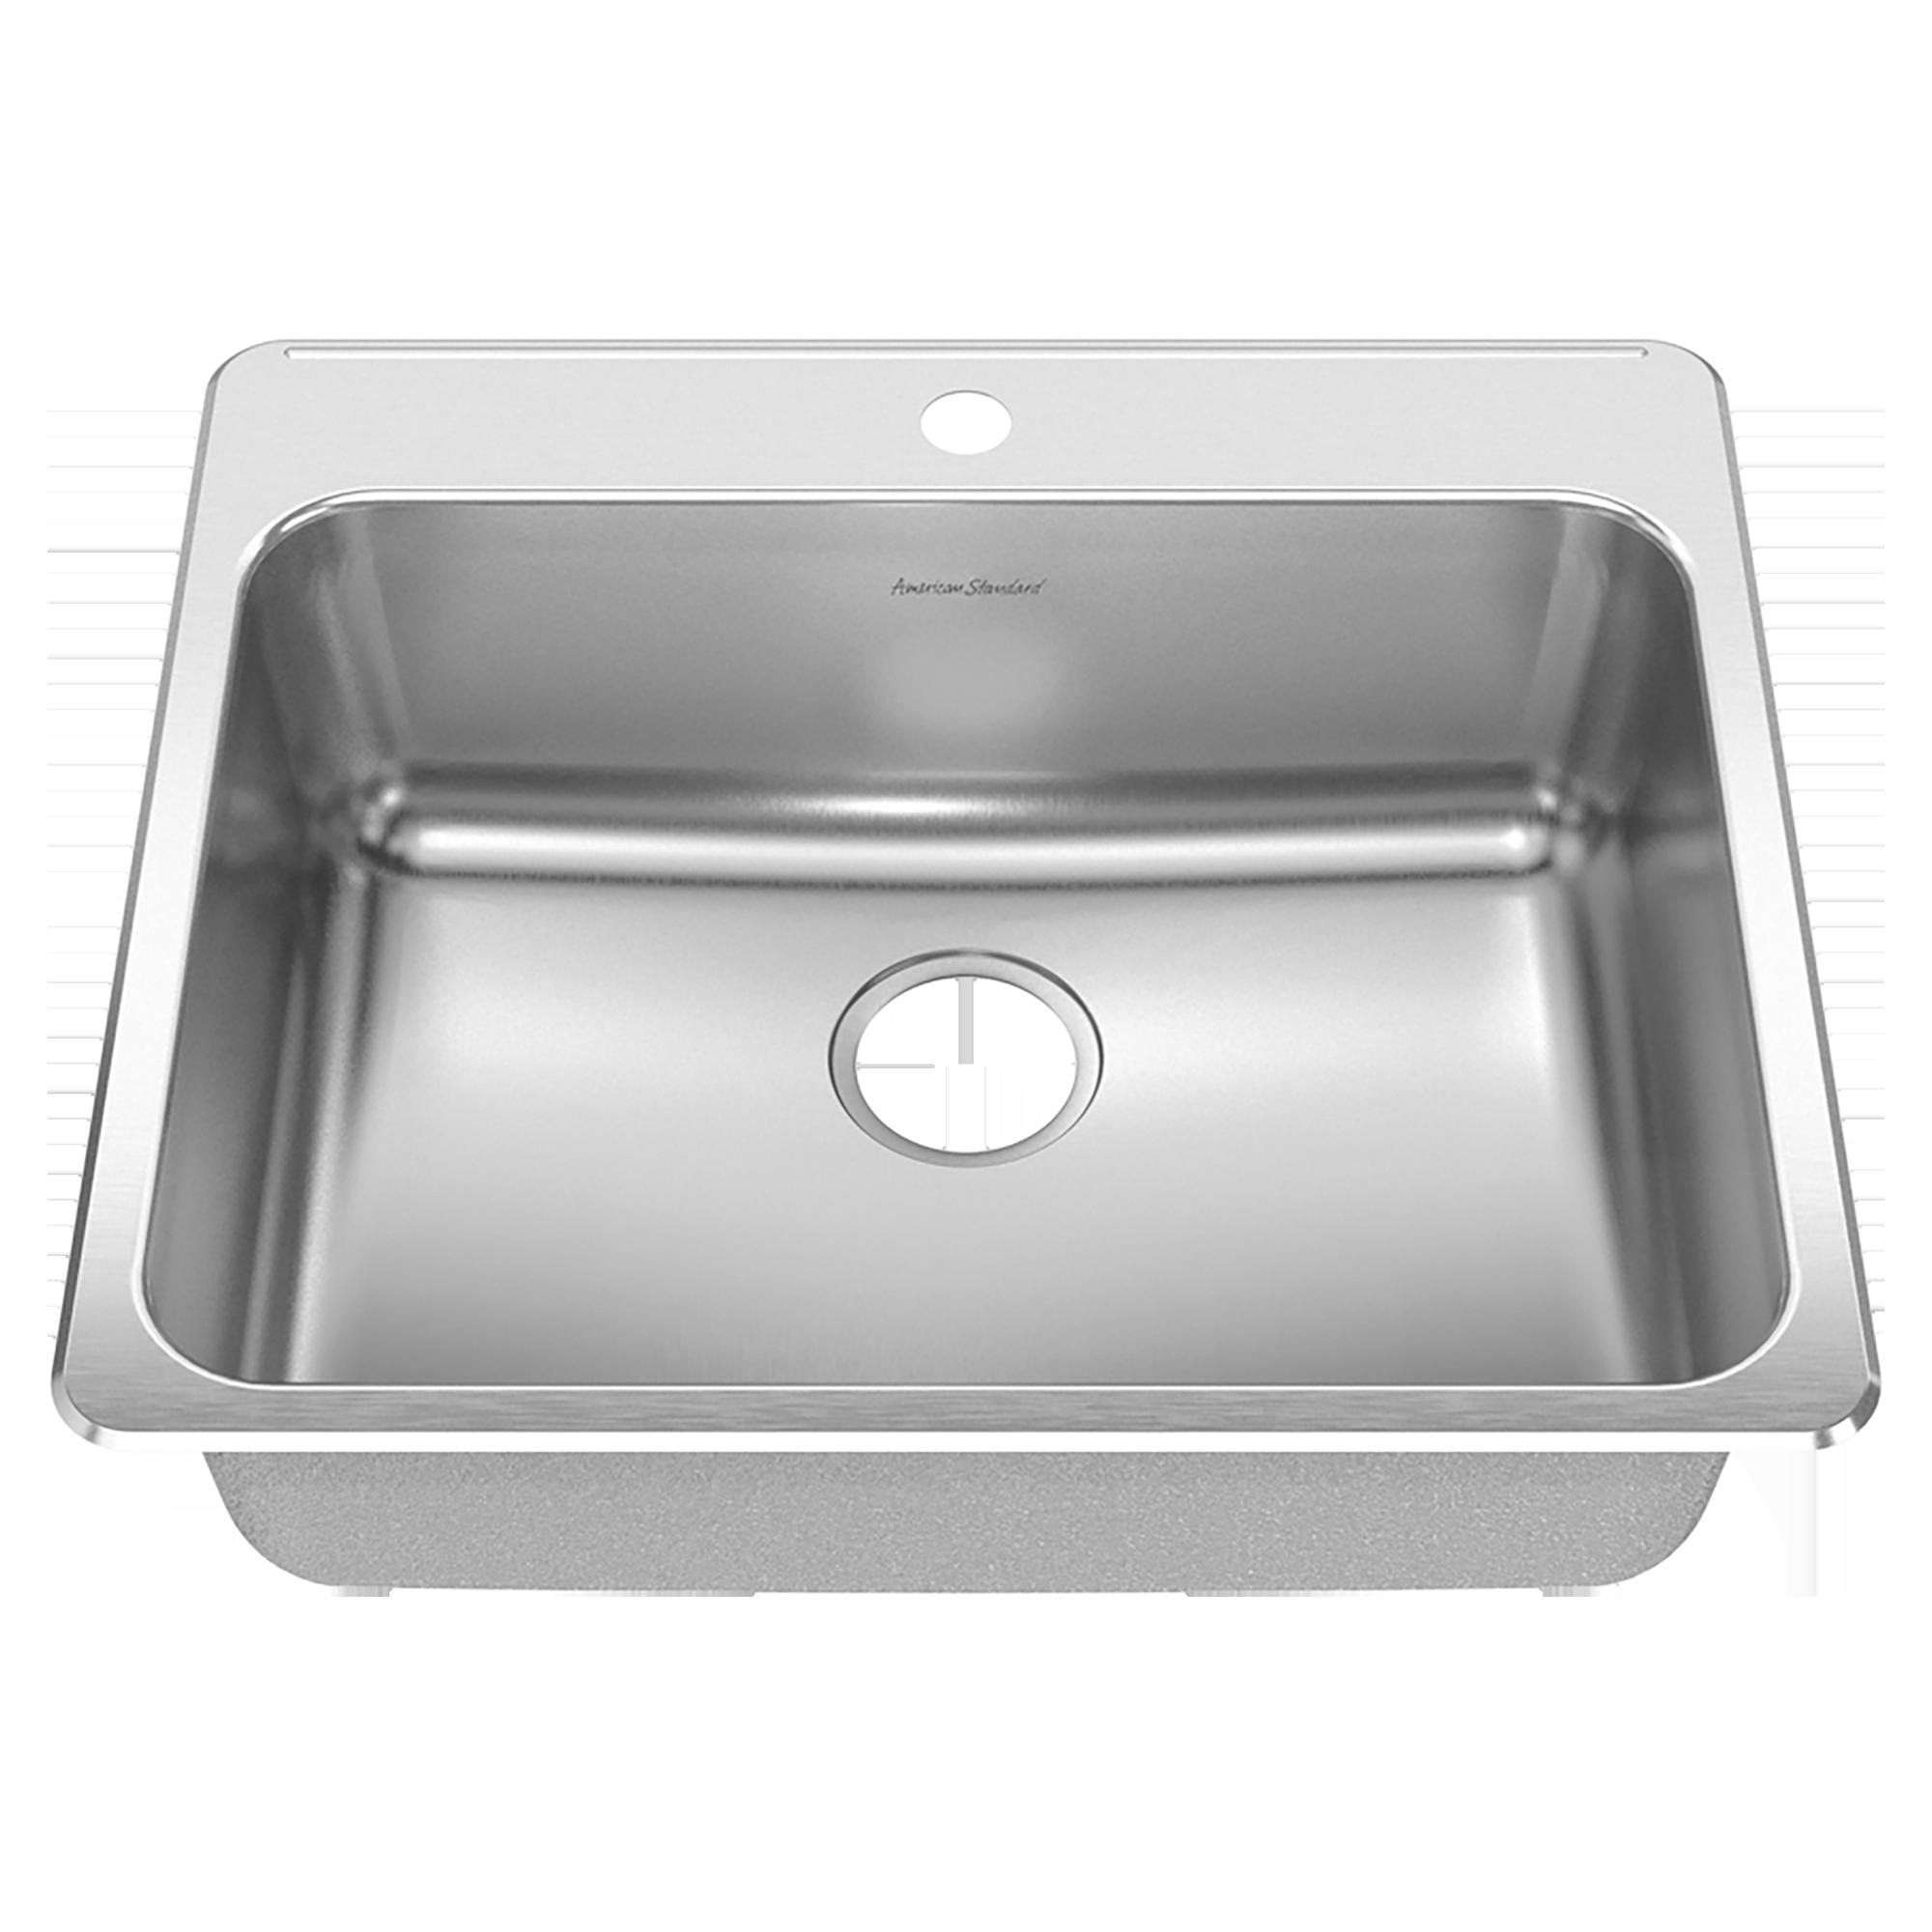 Standard Single Kitchen Sink Dimensions